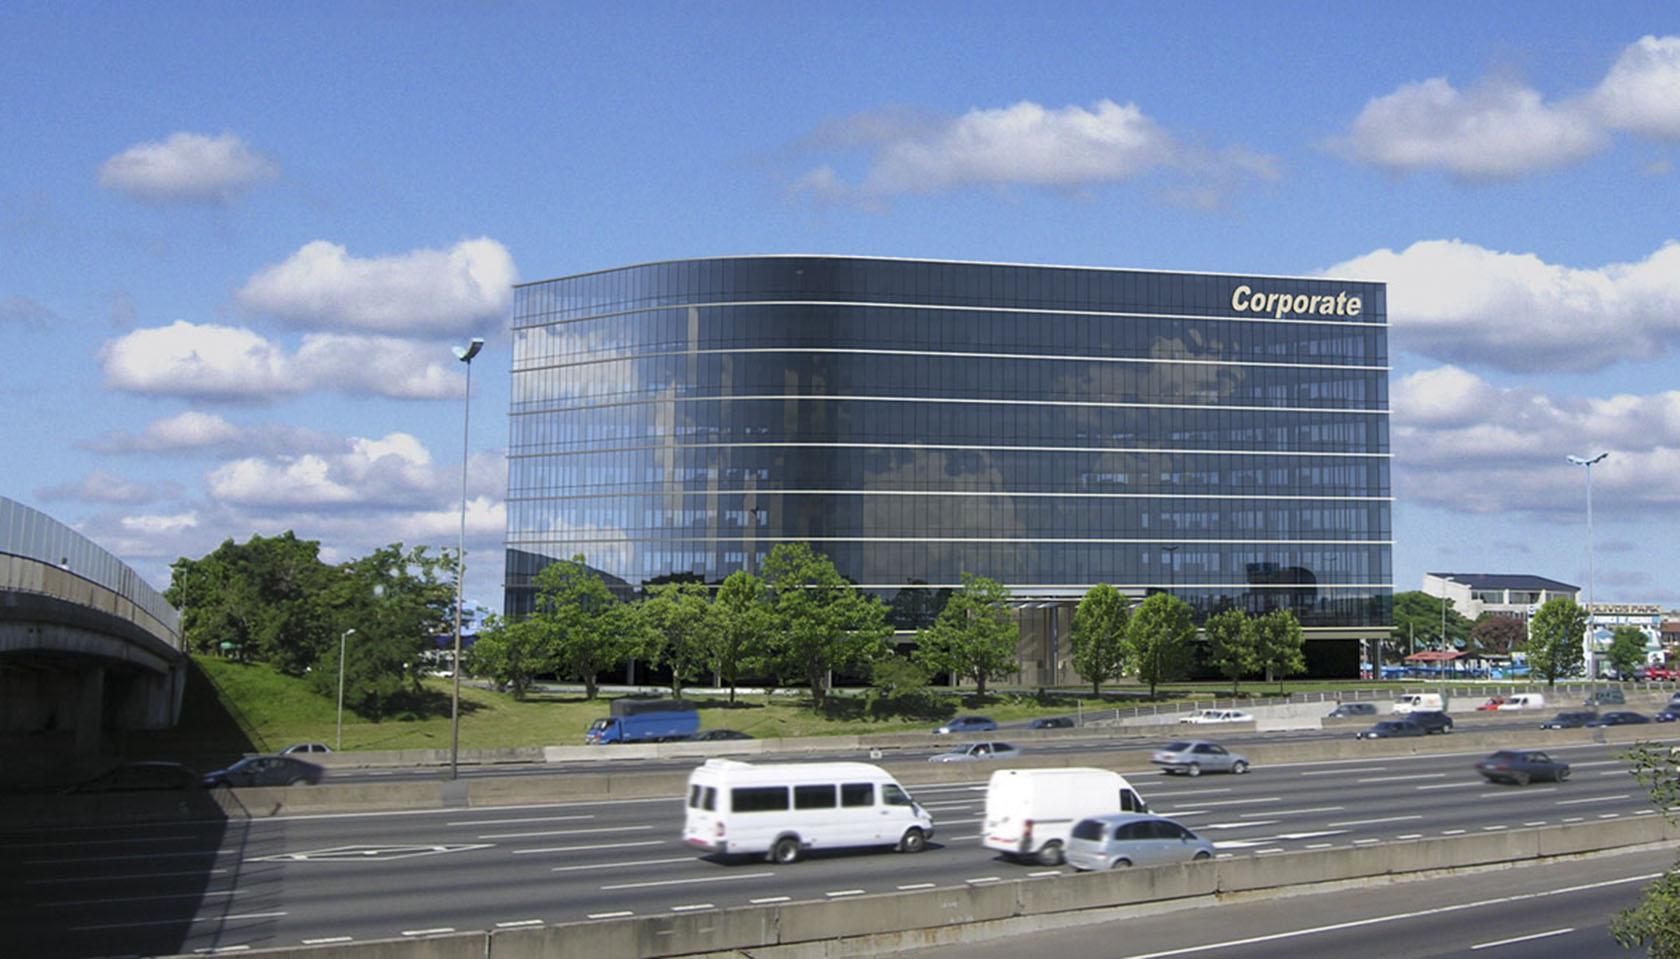 Edificios de oficinas, fachadas vidriadas en oficinas, arquitectura de oficinas, diseño de fachadas